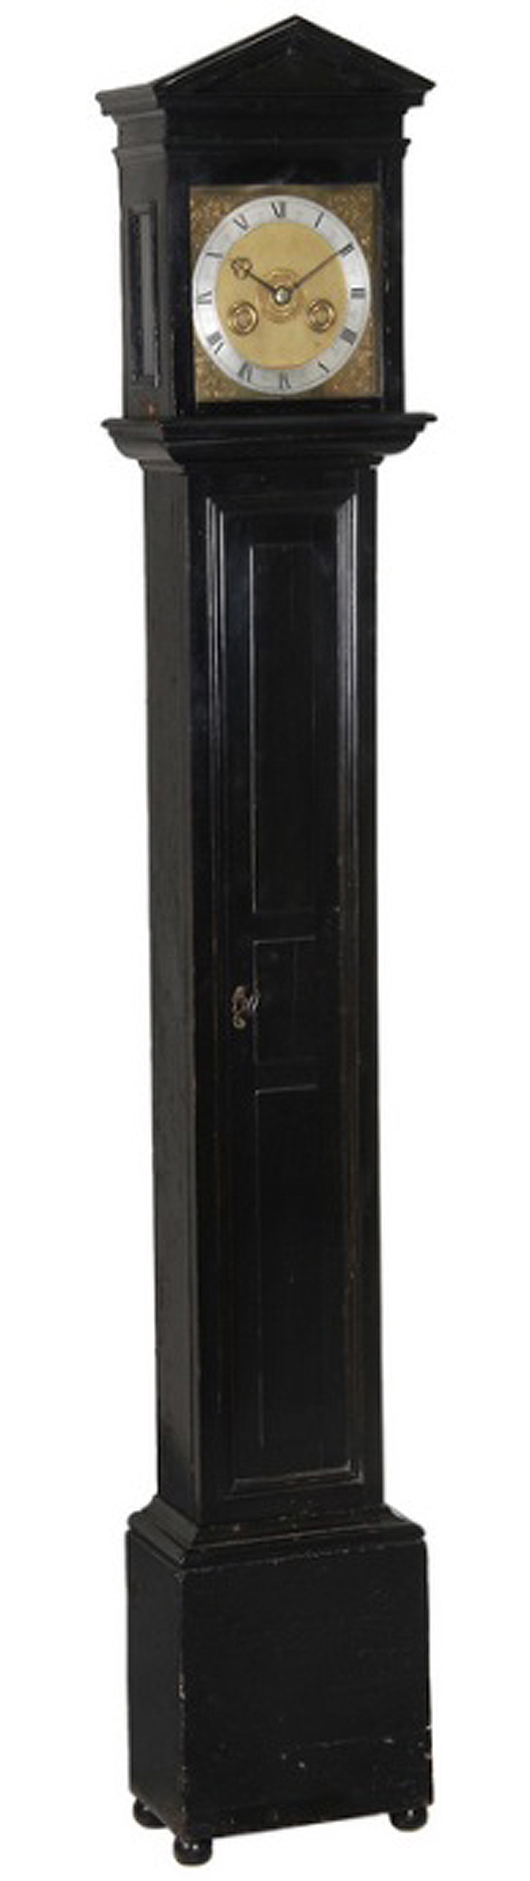 Joseph Knibb long case clock. Estimate: £80,000-£120,000 ($133,455-$200,182). Dreweatts & Bloomsbury image.